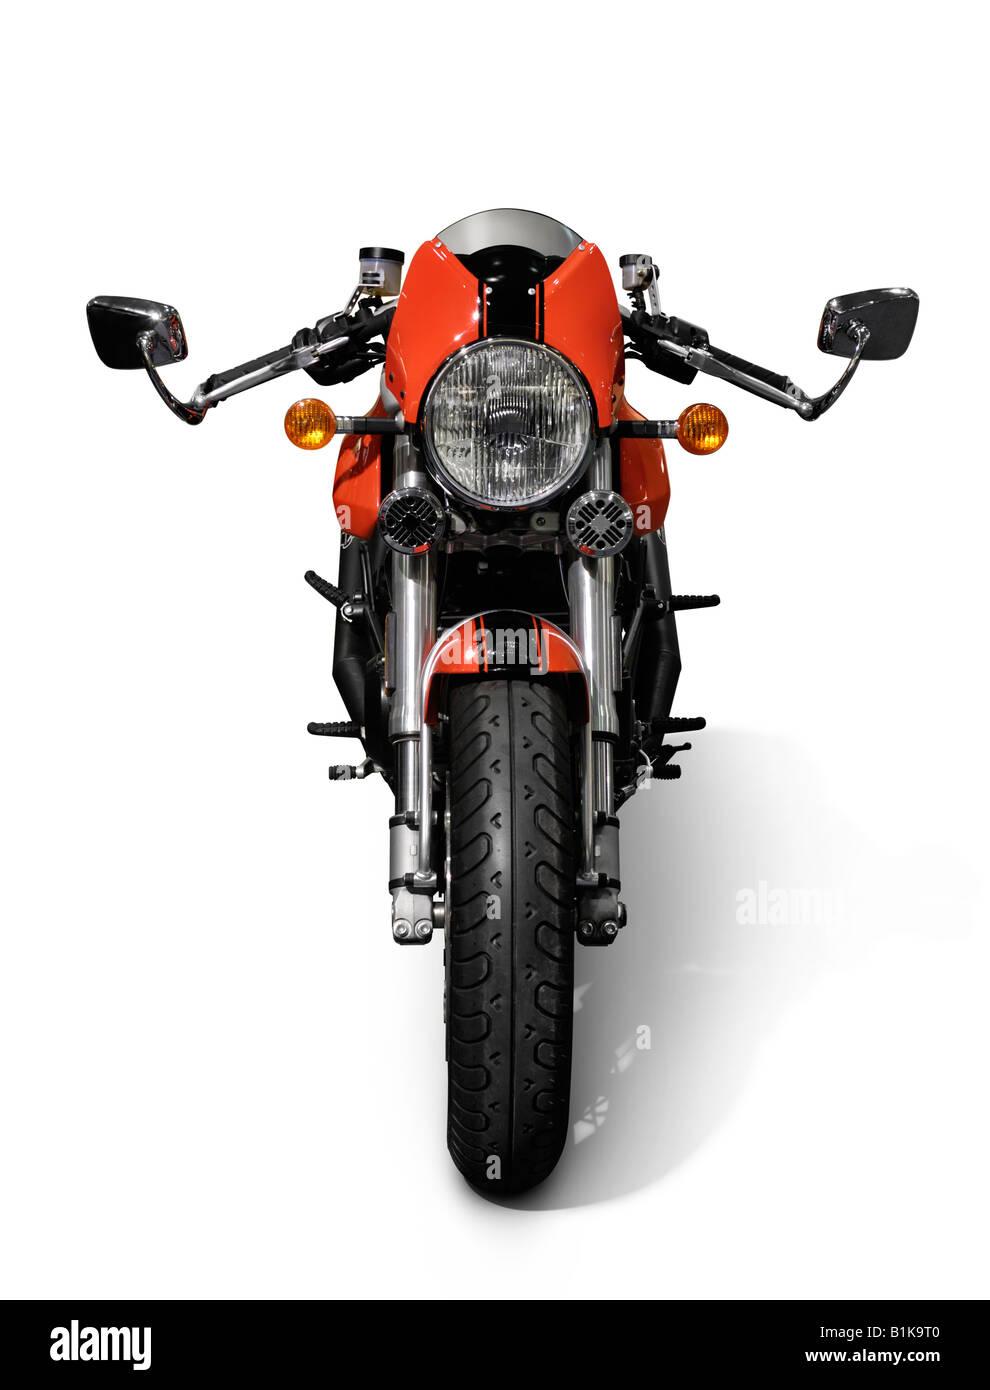 Ducati Sport 1000 motorcycle - Stock Image